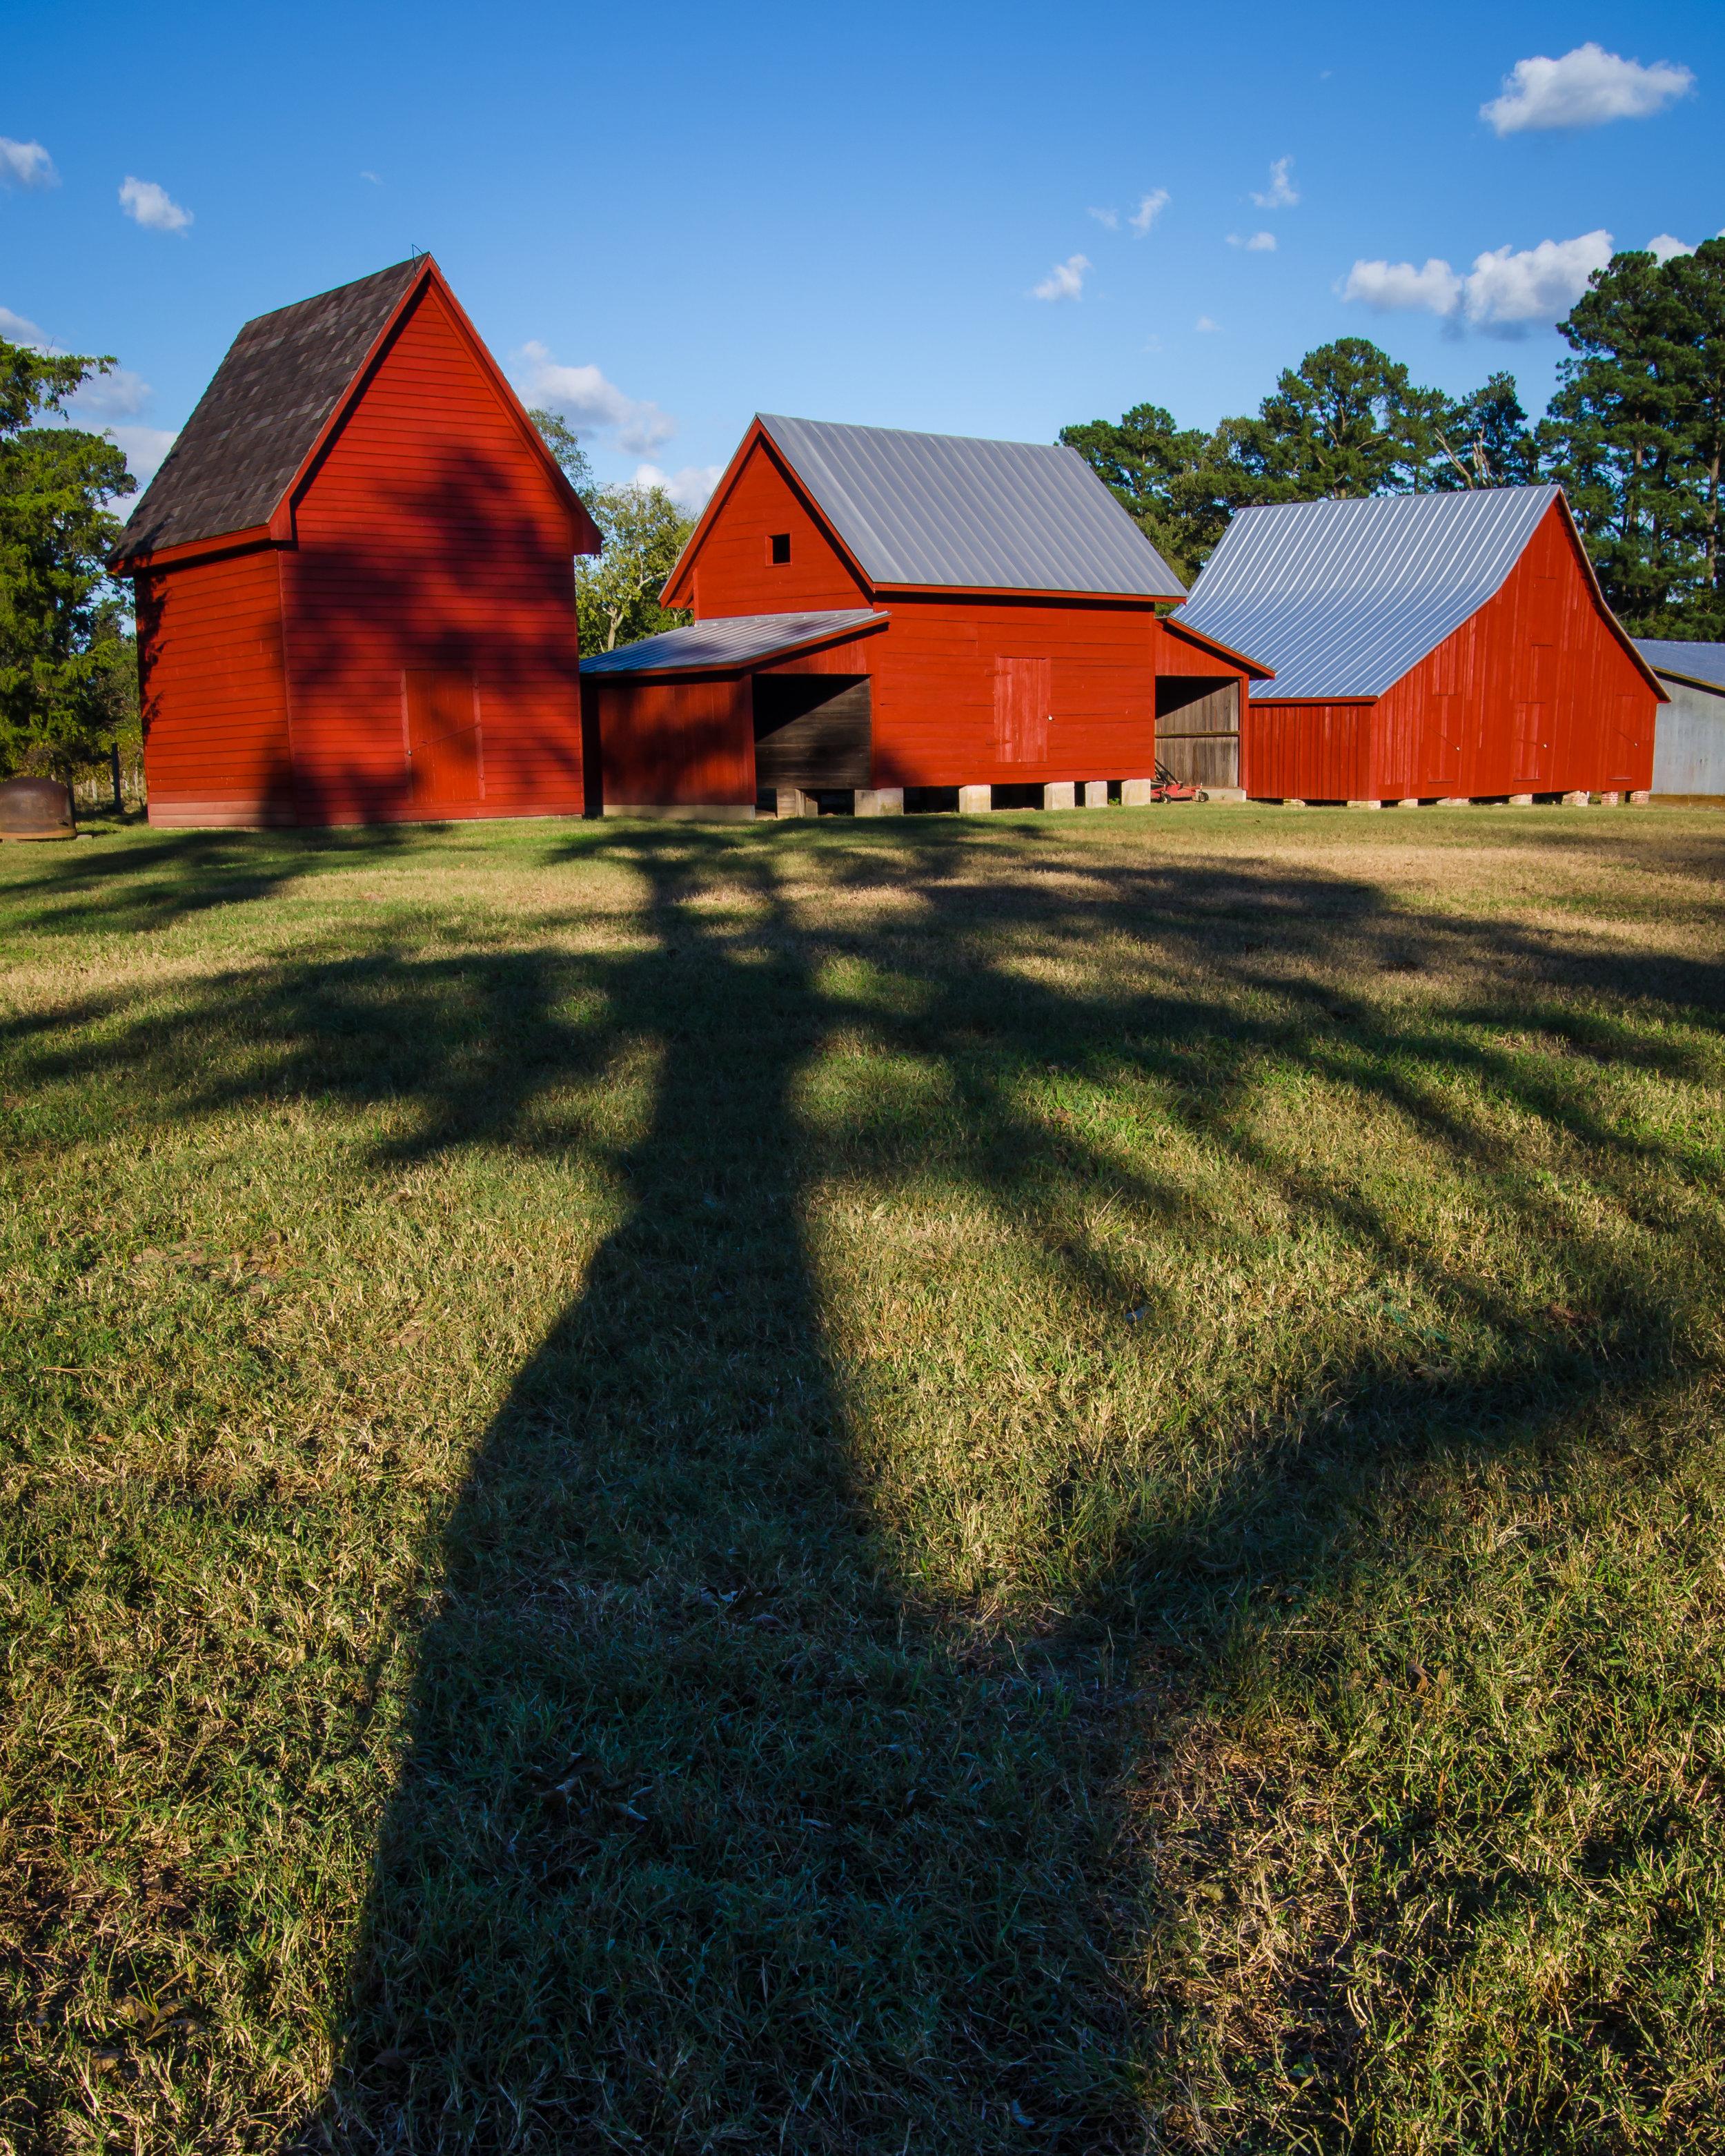 red barns-shadow-smithfield-windsor castle park-isle of wight county-virginia.jpg